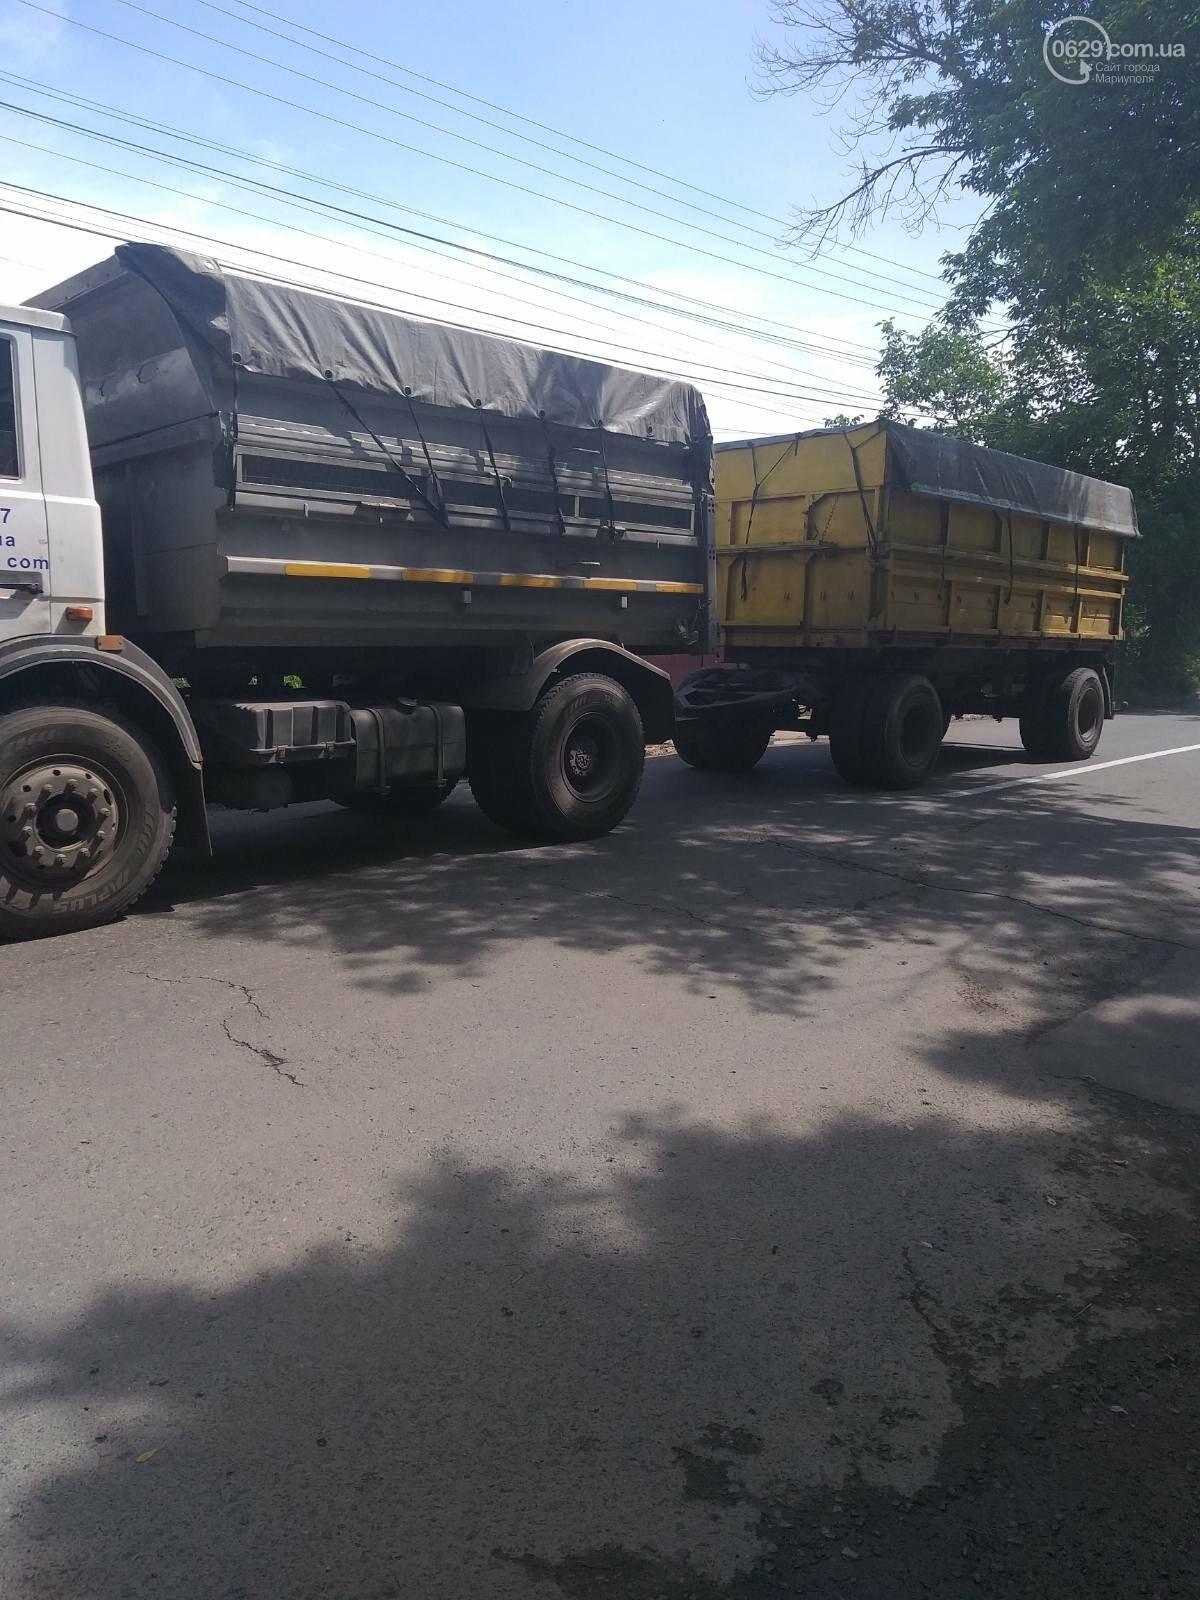 На ММКИ опровергли информацию о том, что транспорт предприятия разрушает улицу Бахмутскую, фото-3